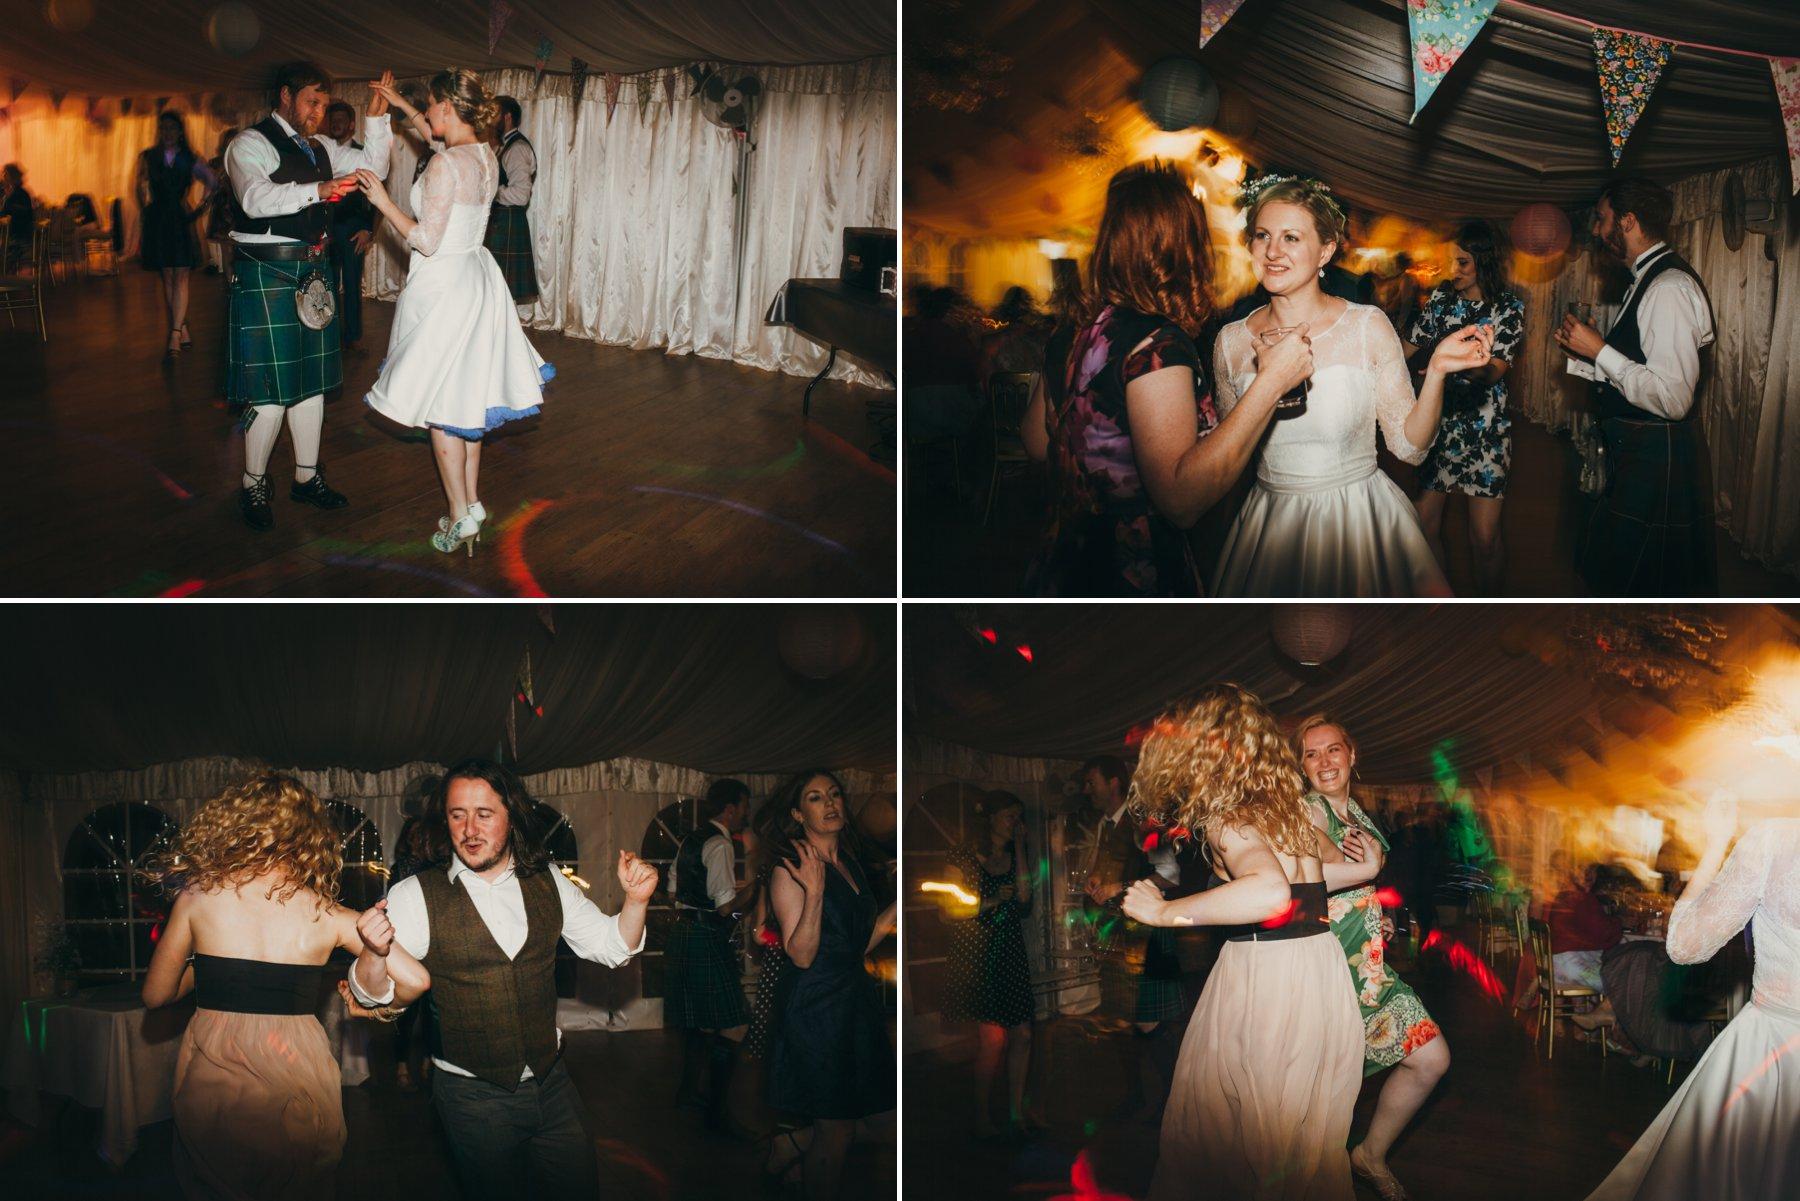 petitmoulin_france_bordeaux_weddings_0133